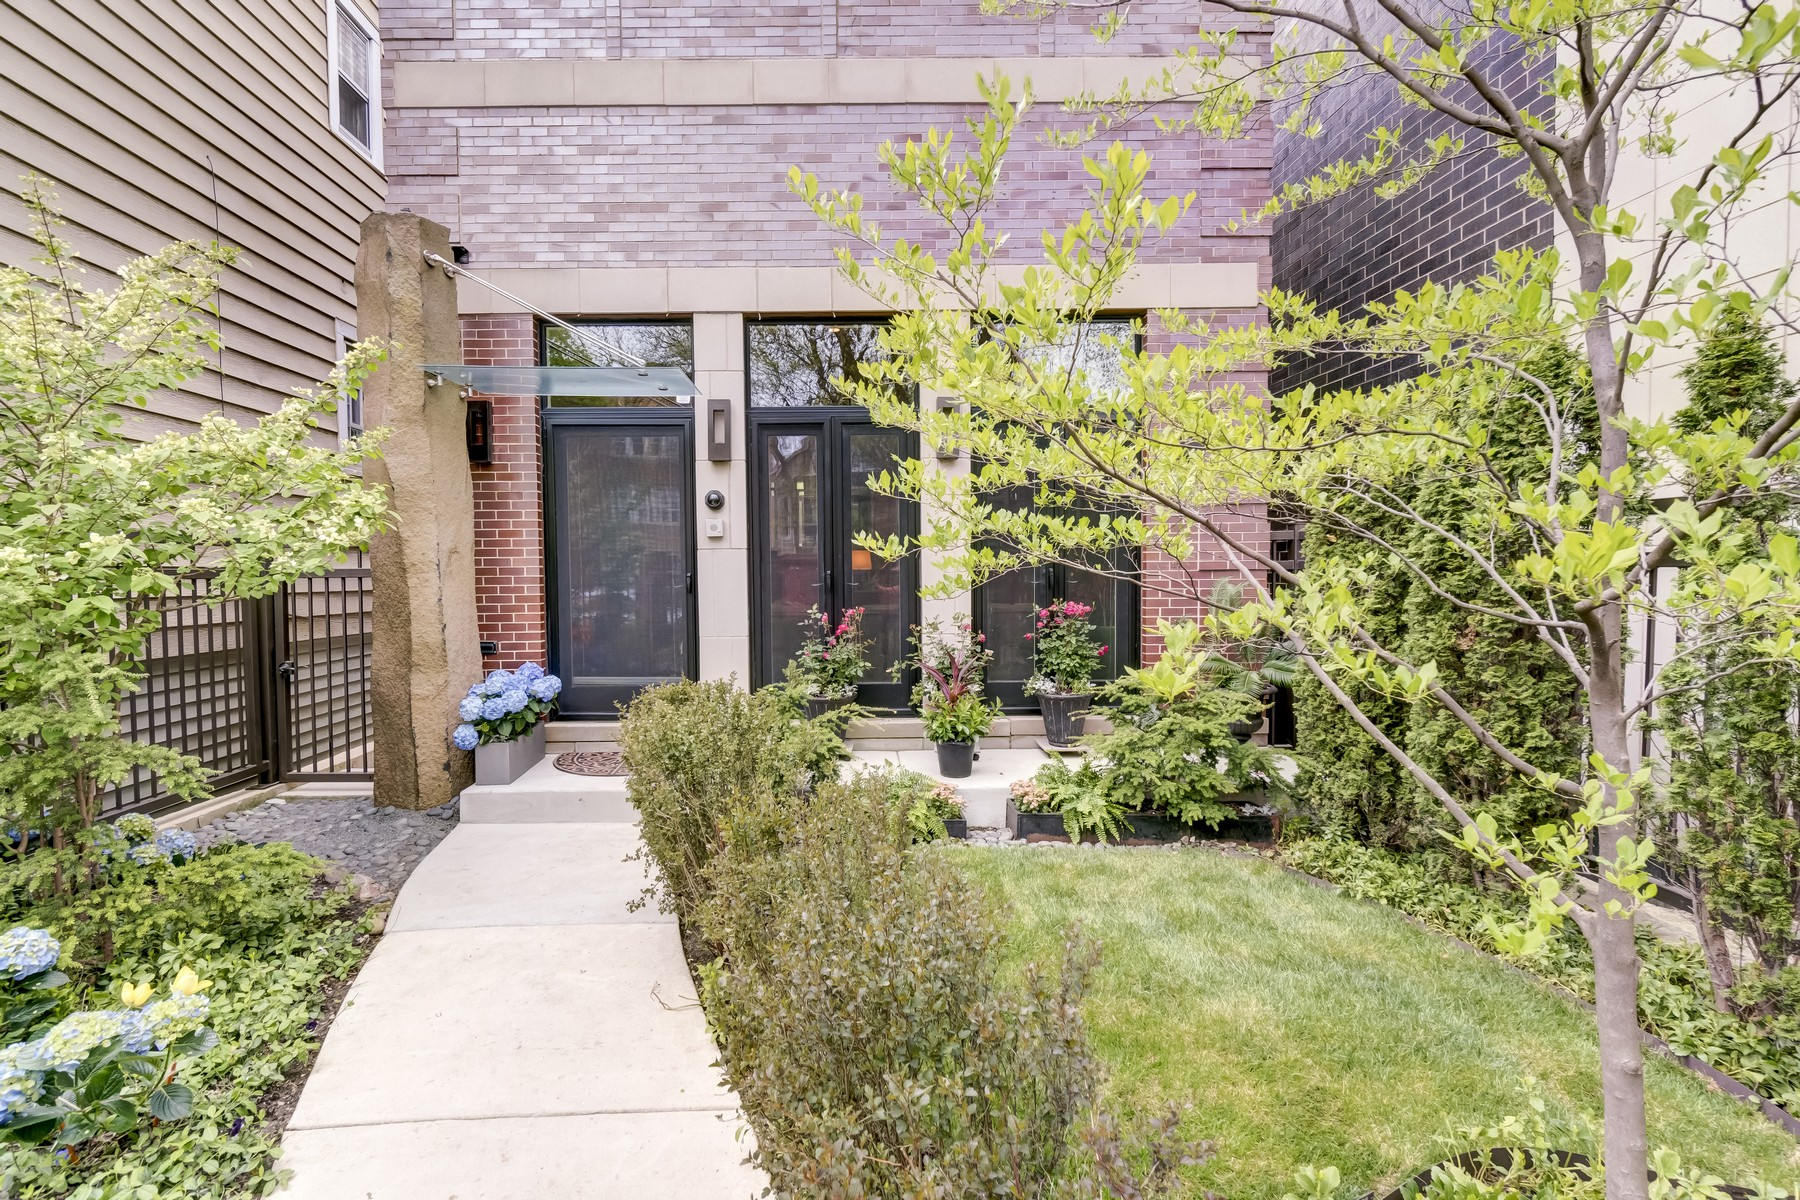 Vivienda unifamiliar por un Venta en Stunning Brick and Limestone Residence 2654 N Marshfield Avenue Chicago, Illinois, 60614 Estados Unidos